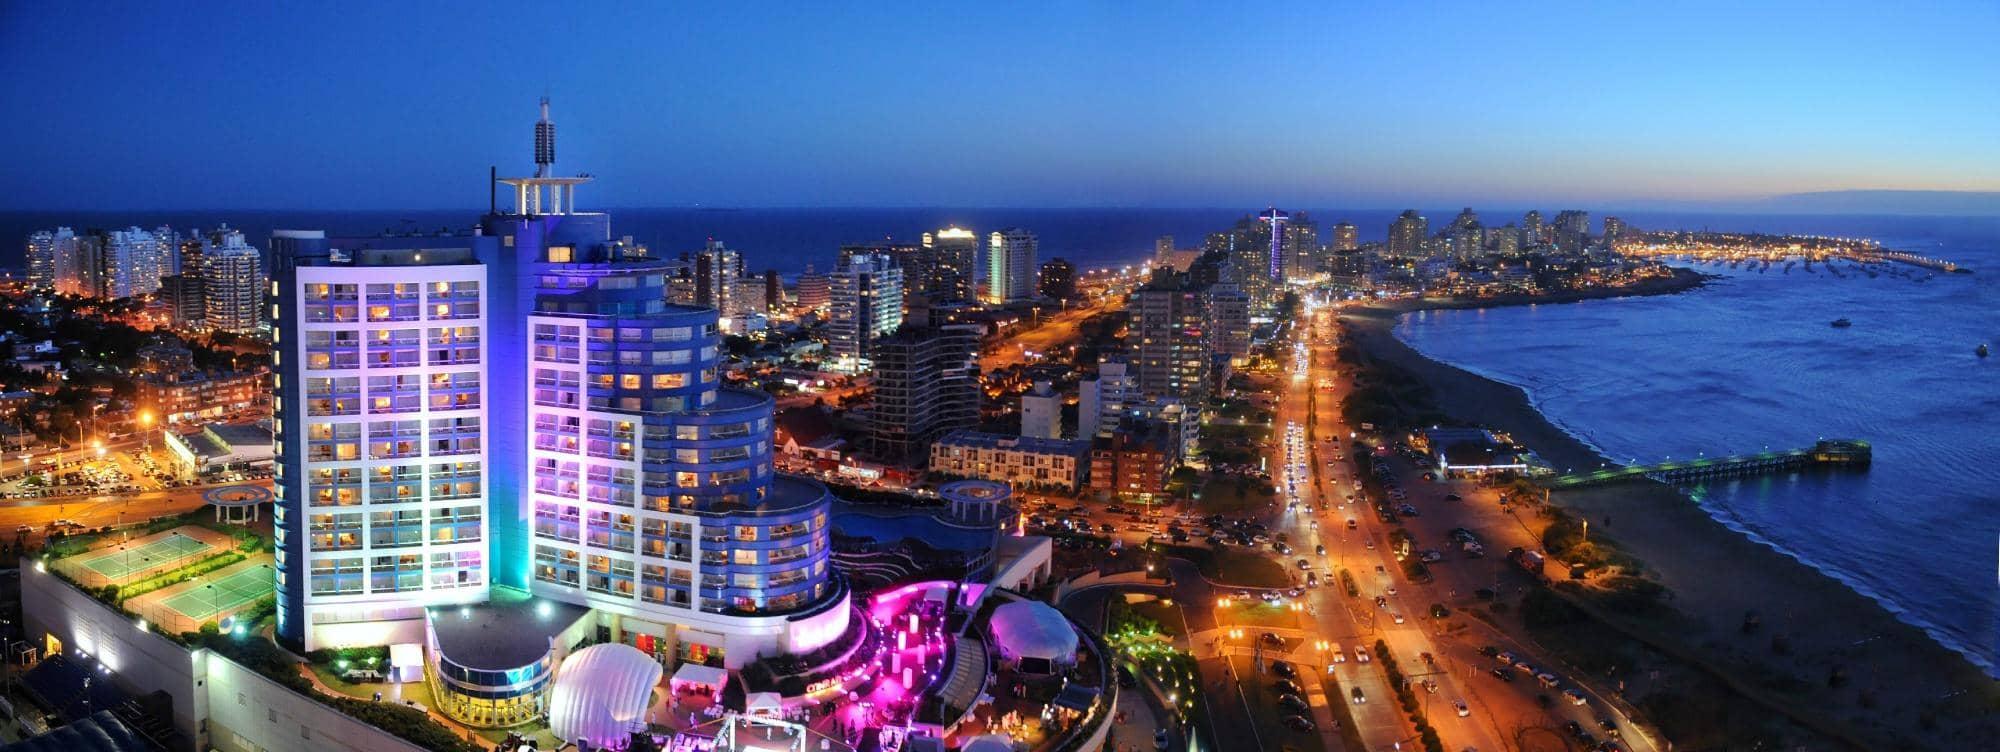 Aluguel de carro em Montevidéu: Punta del Este - Uruguai